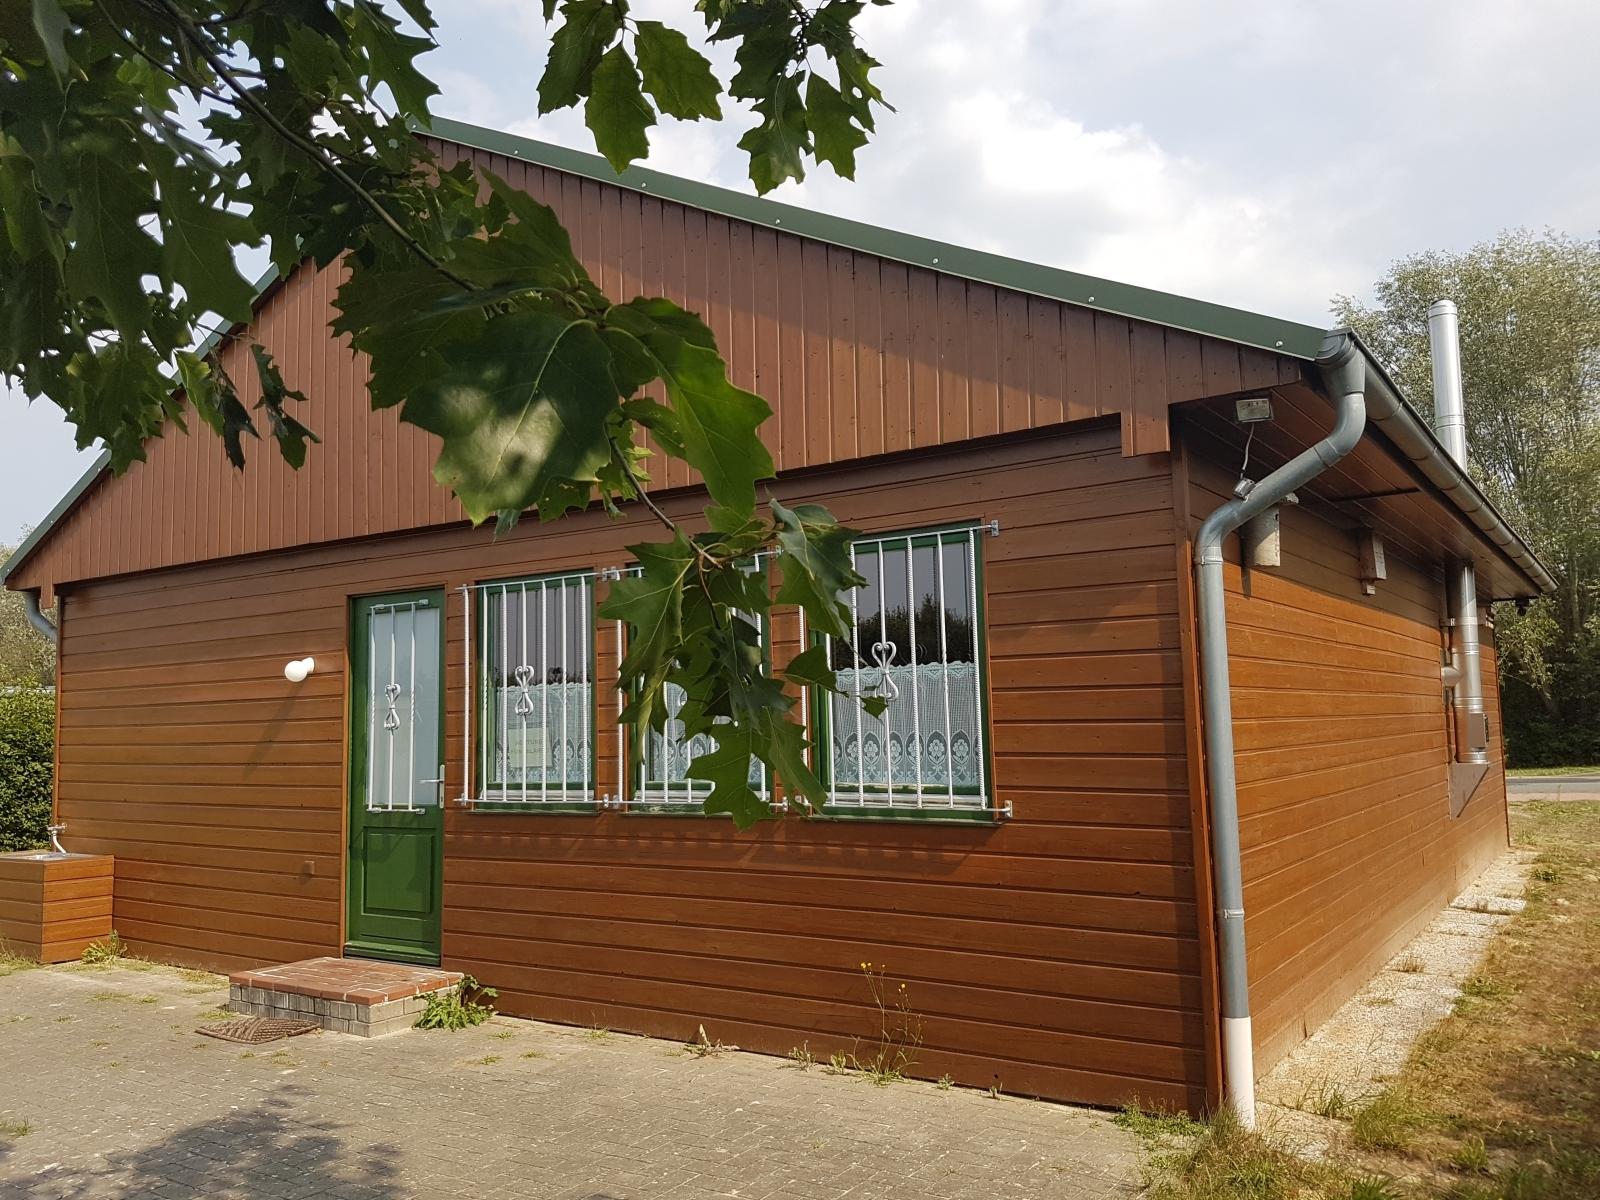 2018-08-22-vereinsheim07